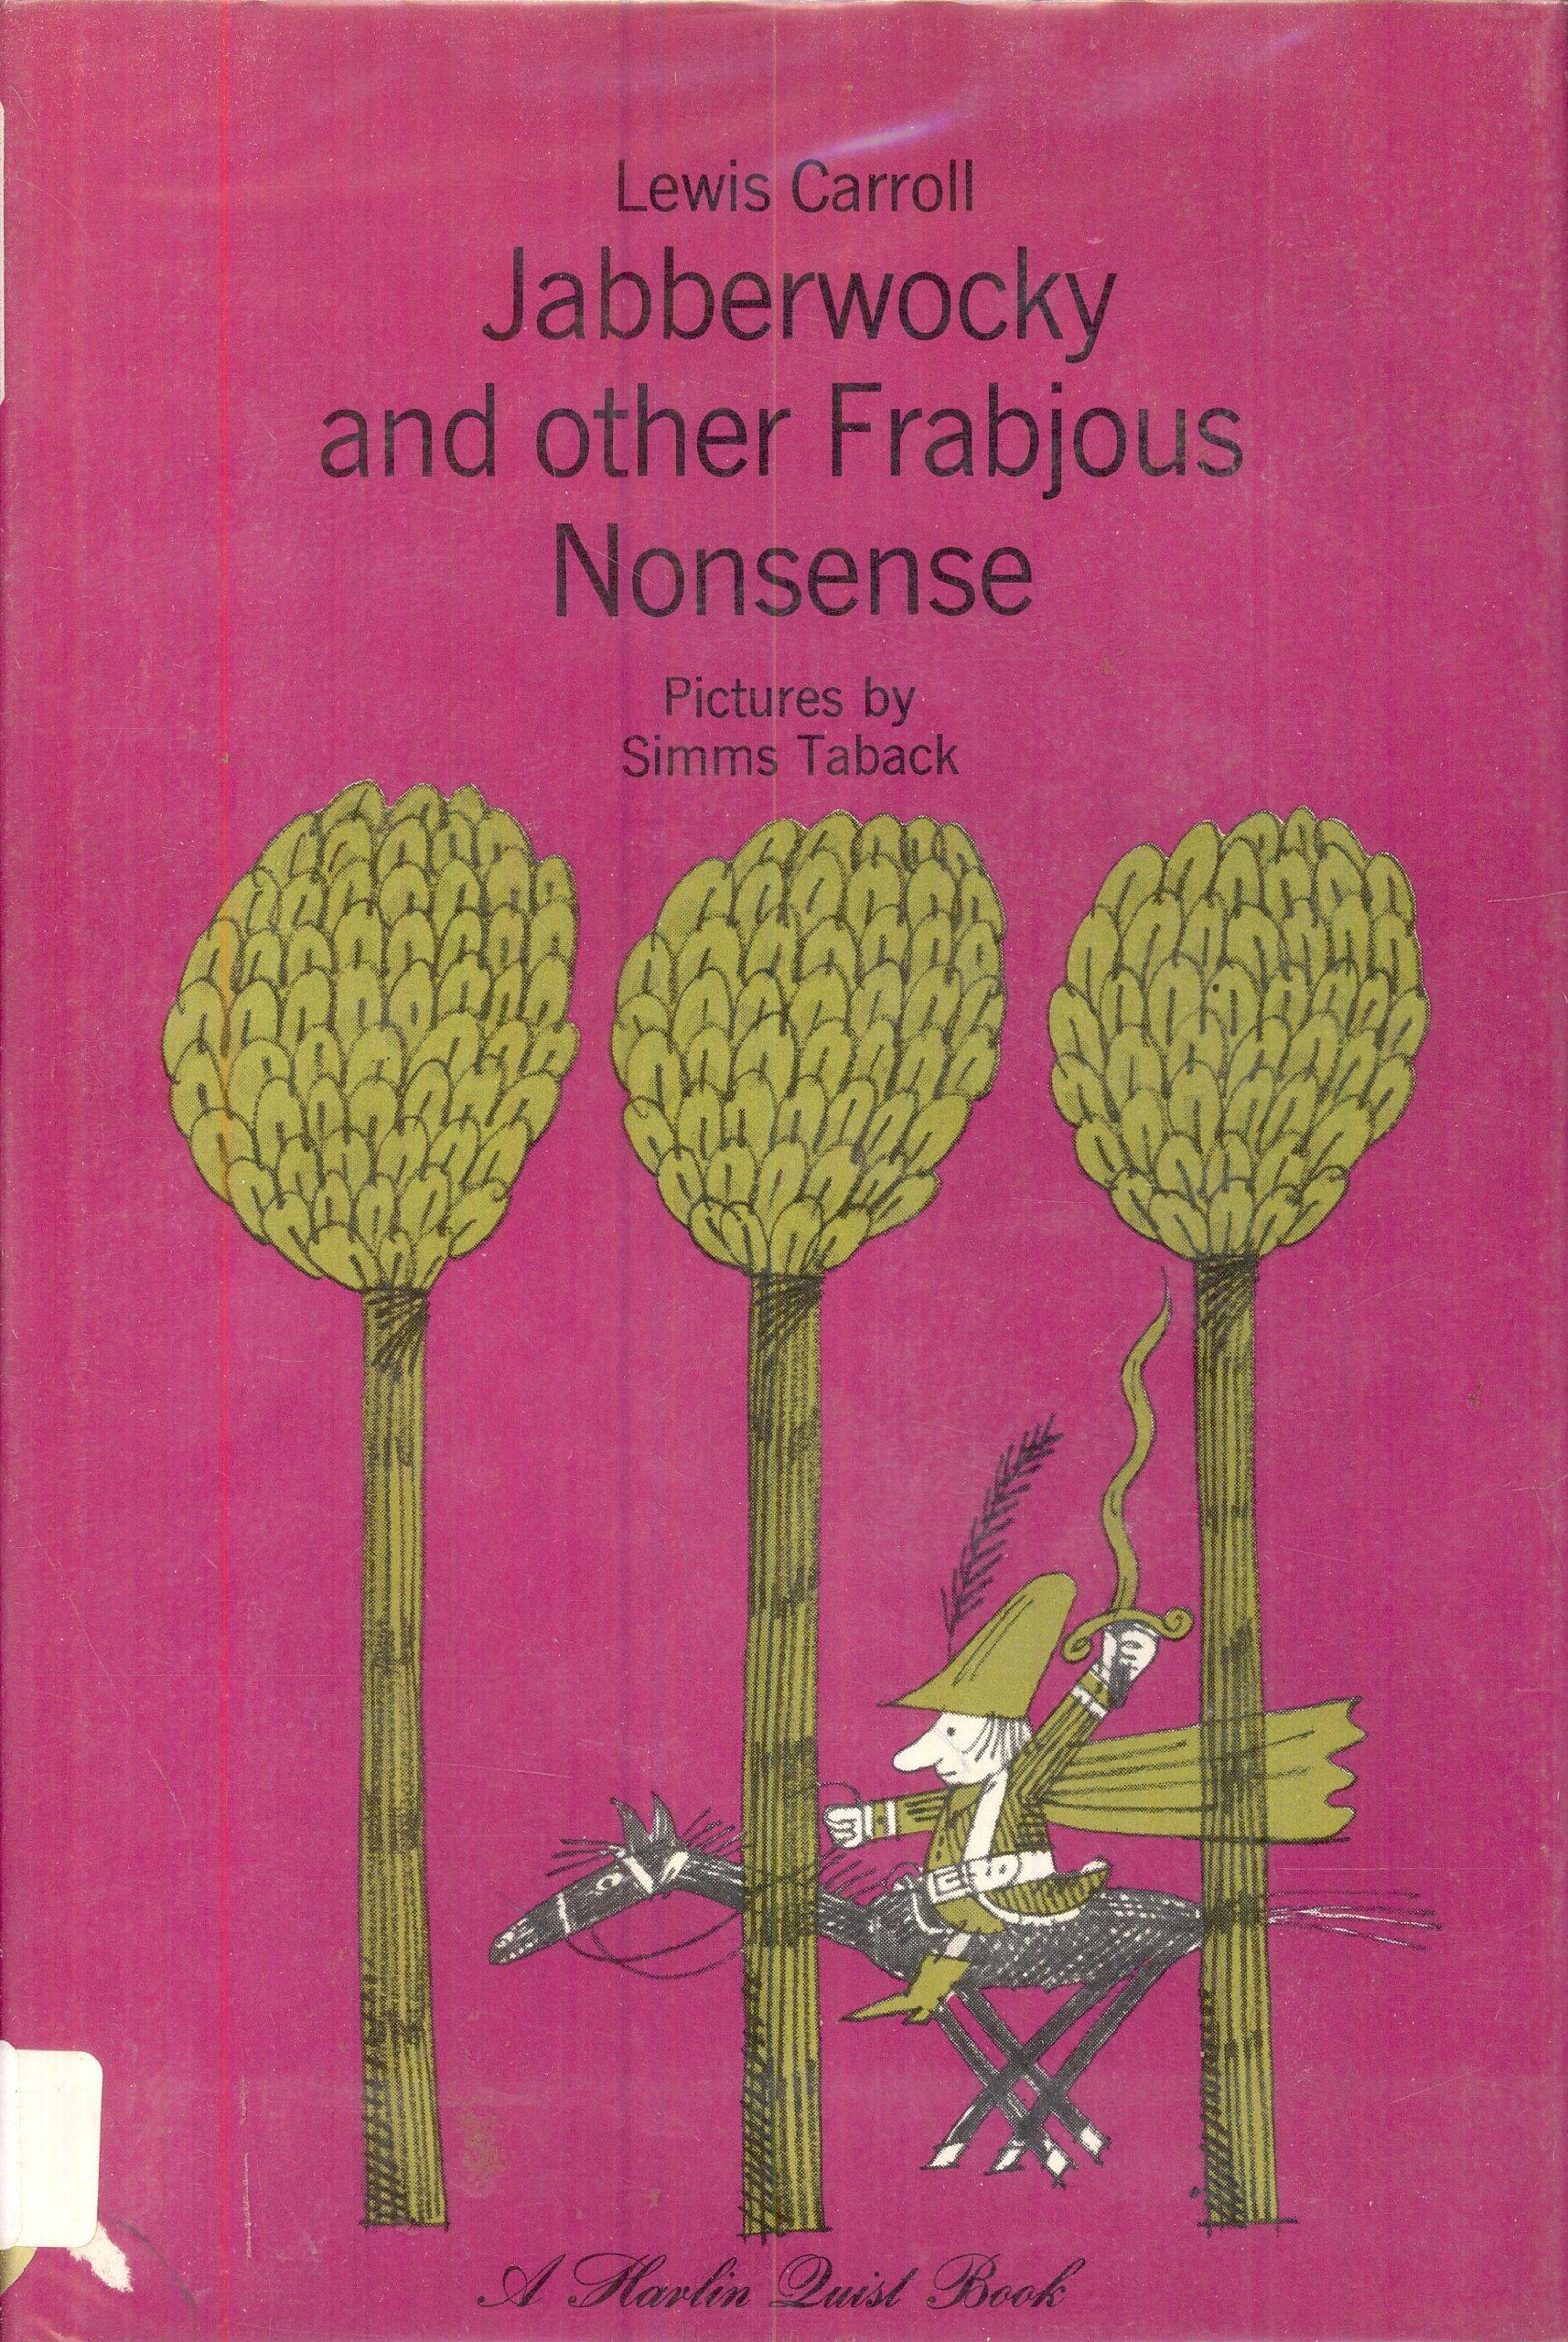 Jabberwocky and Other Frabjous Nonsense